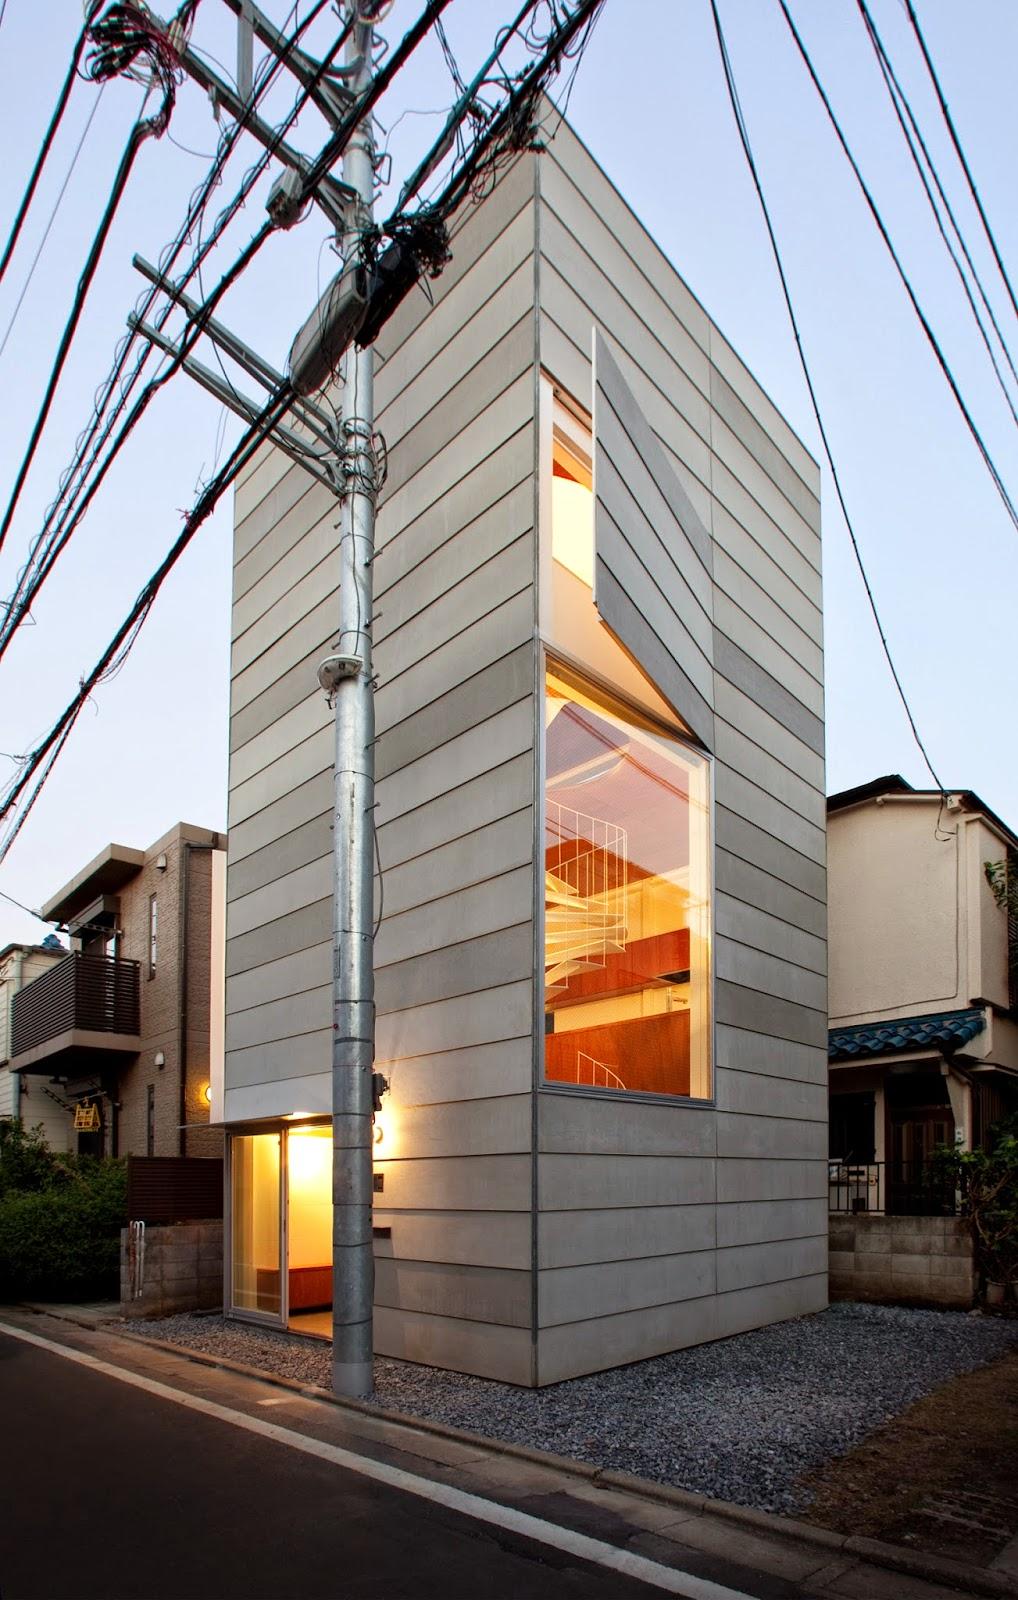 tiny house 16m2 square